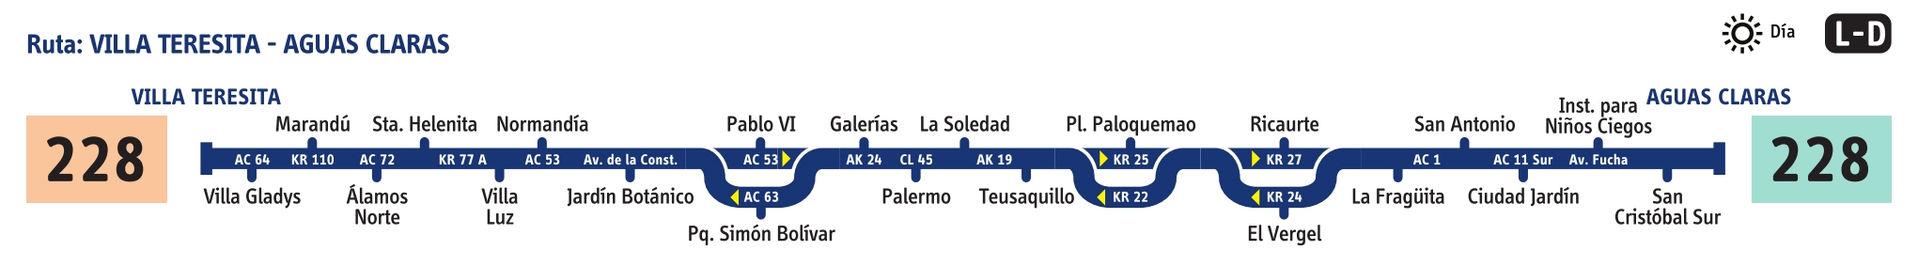 Ruta SITP: 228 Villa Teresita ↔ Aguas Claras [Urbana] 8